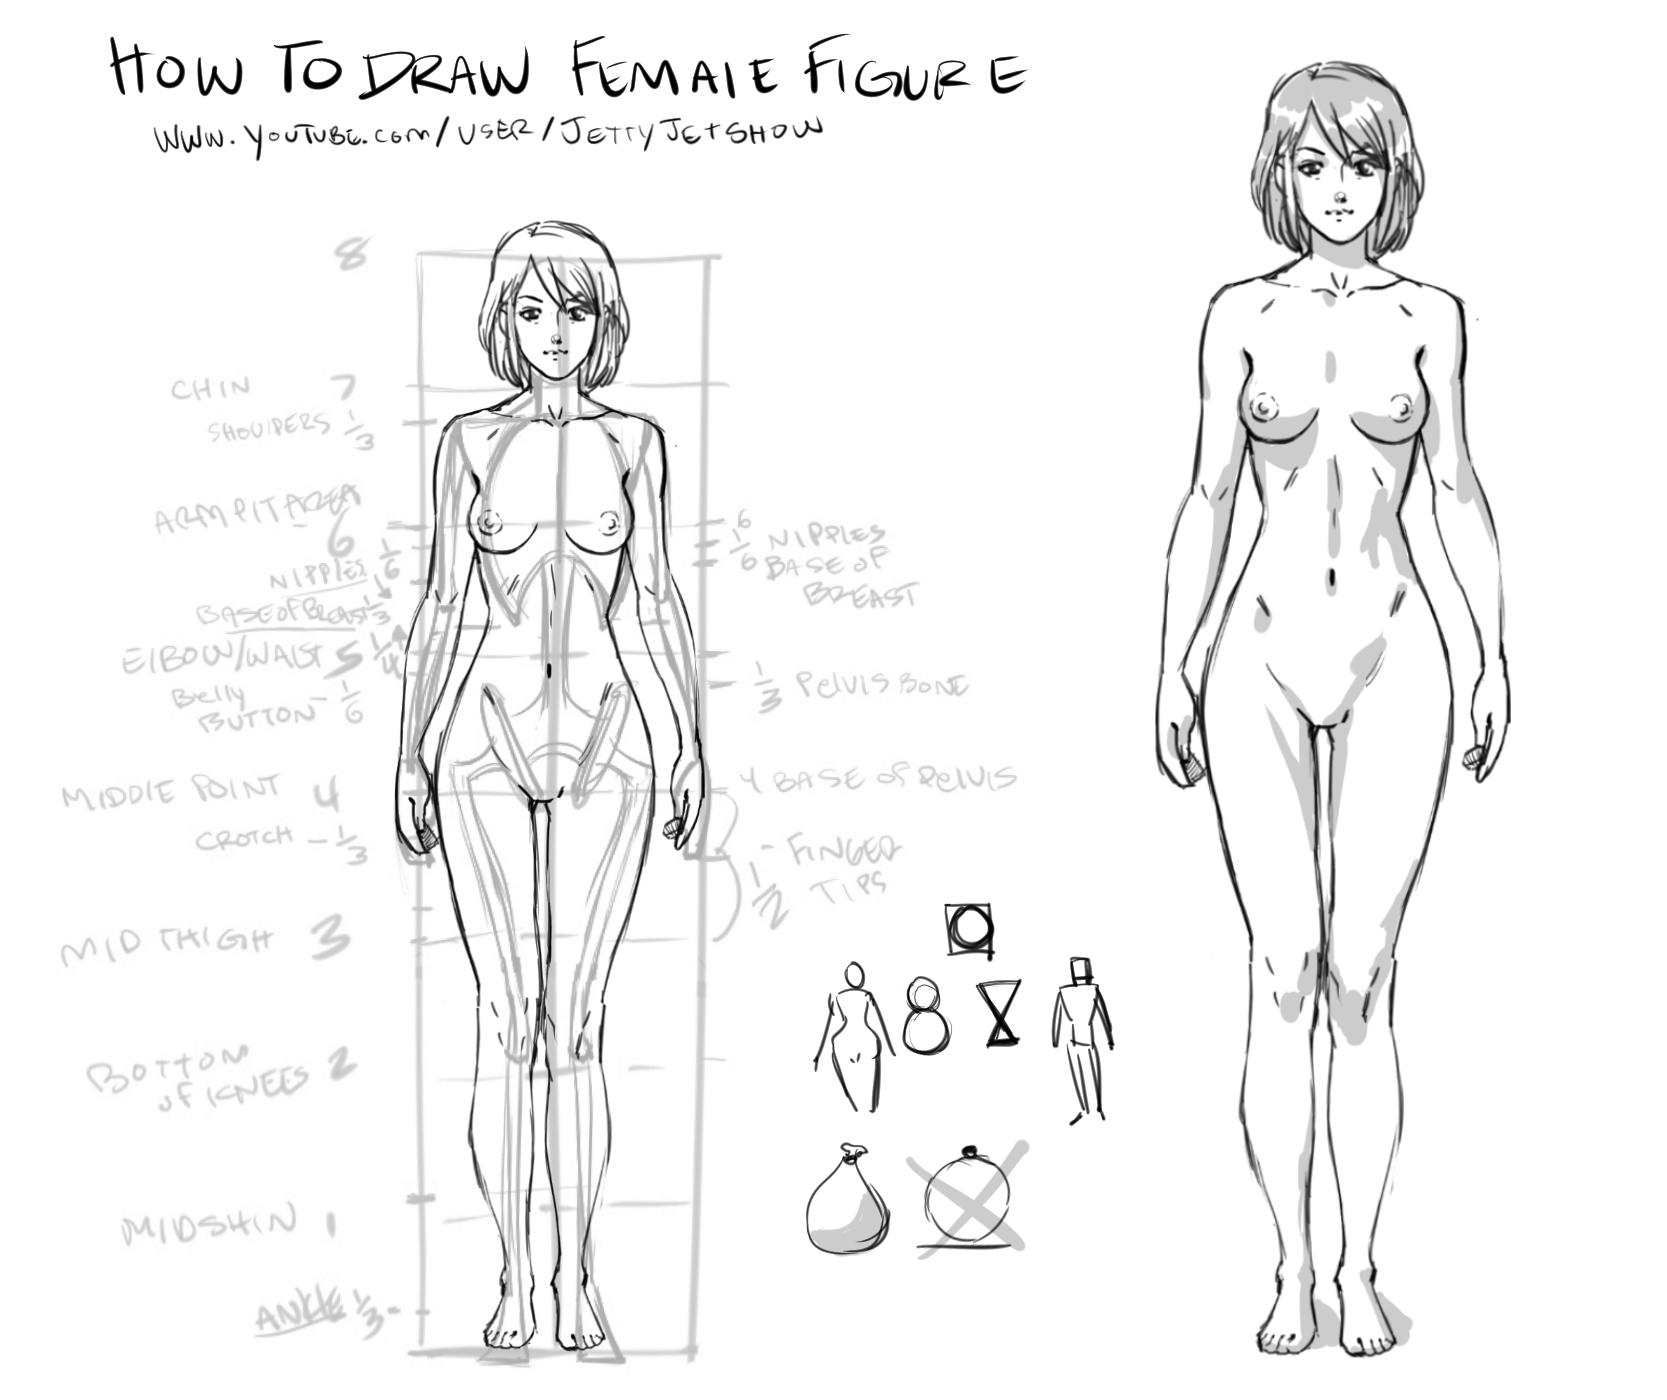 Beginnier How to Draw Female